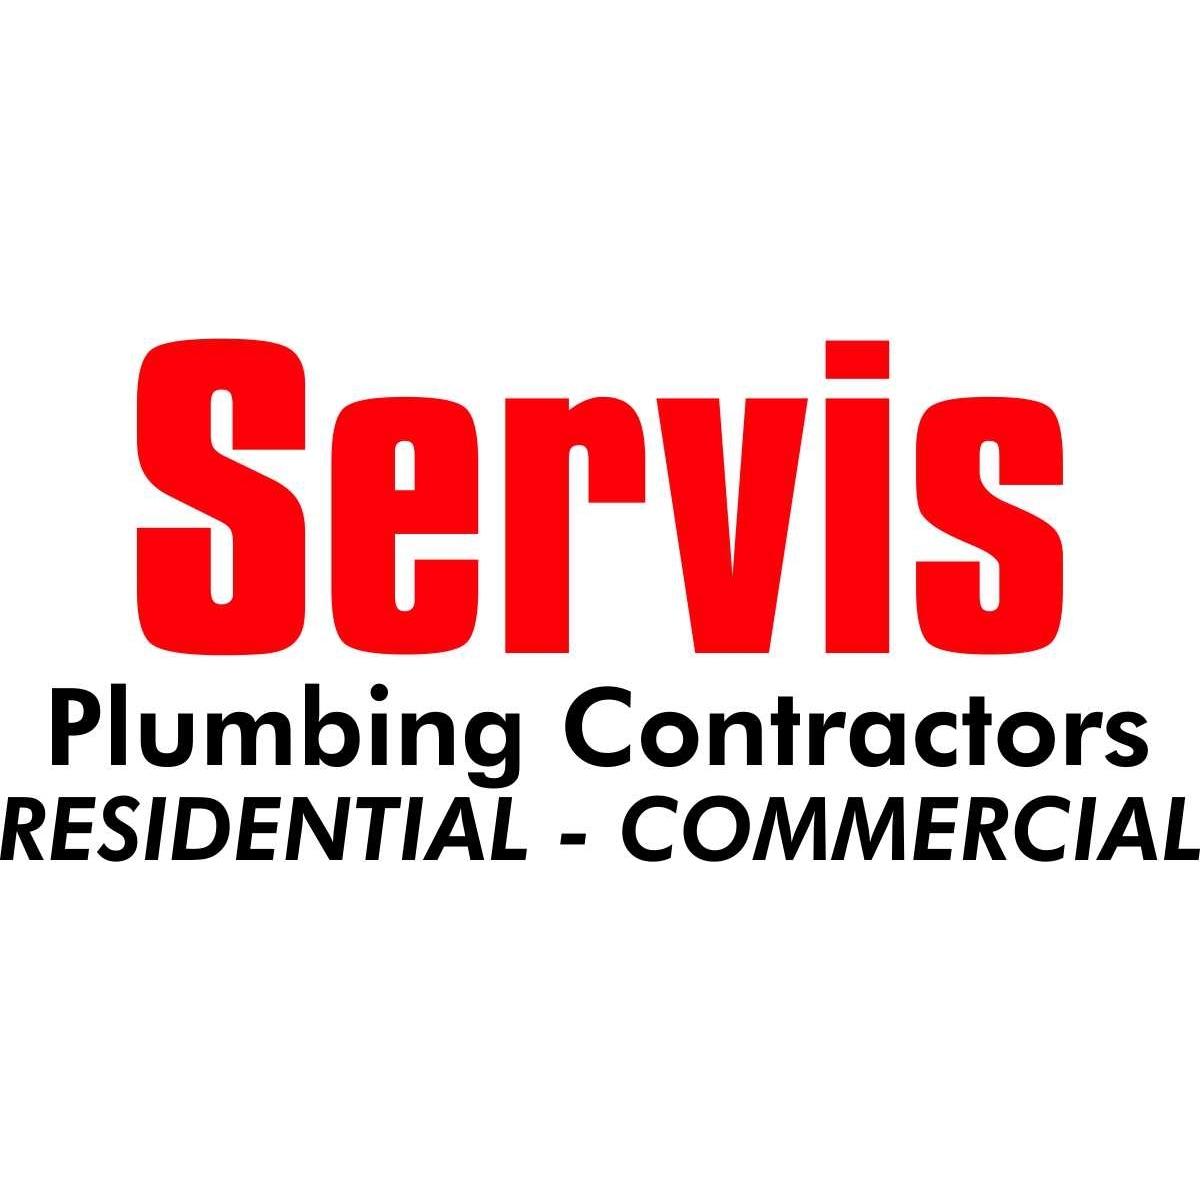 Servis Plumbing - ad image